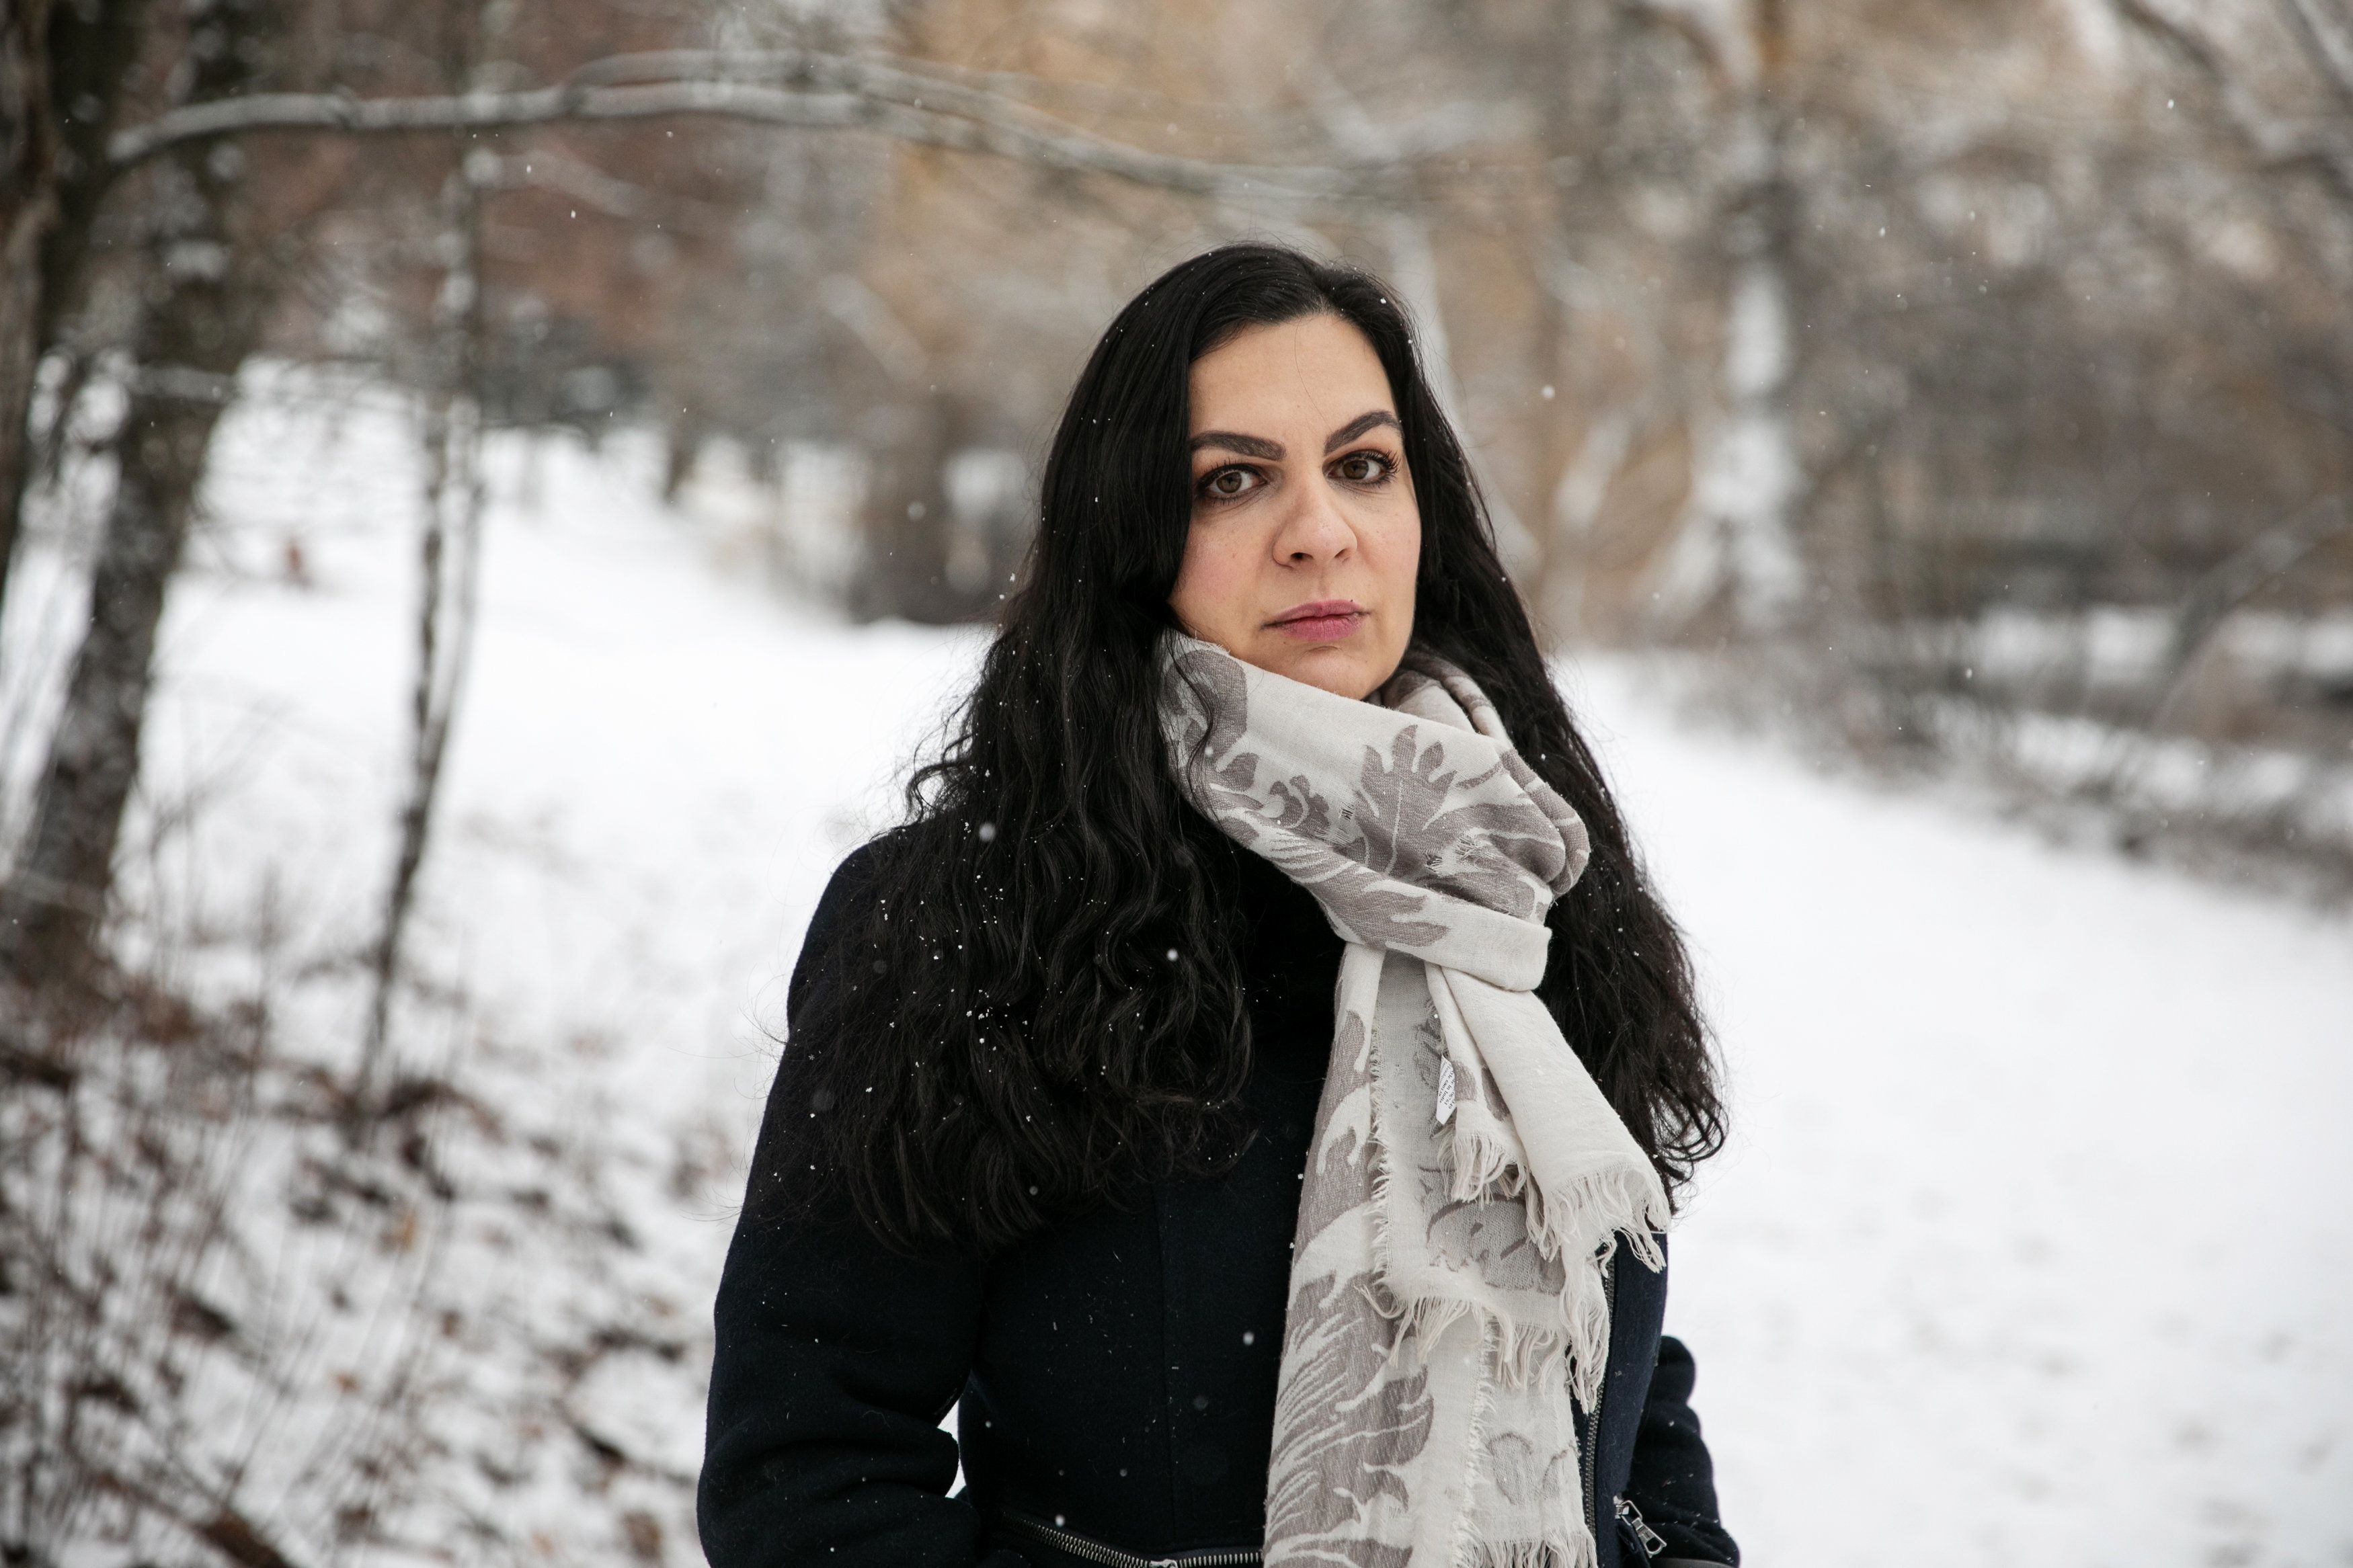 WHITEFISH, MONTANA - December 10, 2018: NIna Kouprianova poses for a portrait in Whitefish. Ilana Panich-Lisman for the Huffington Post